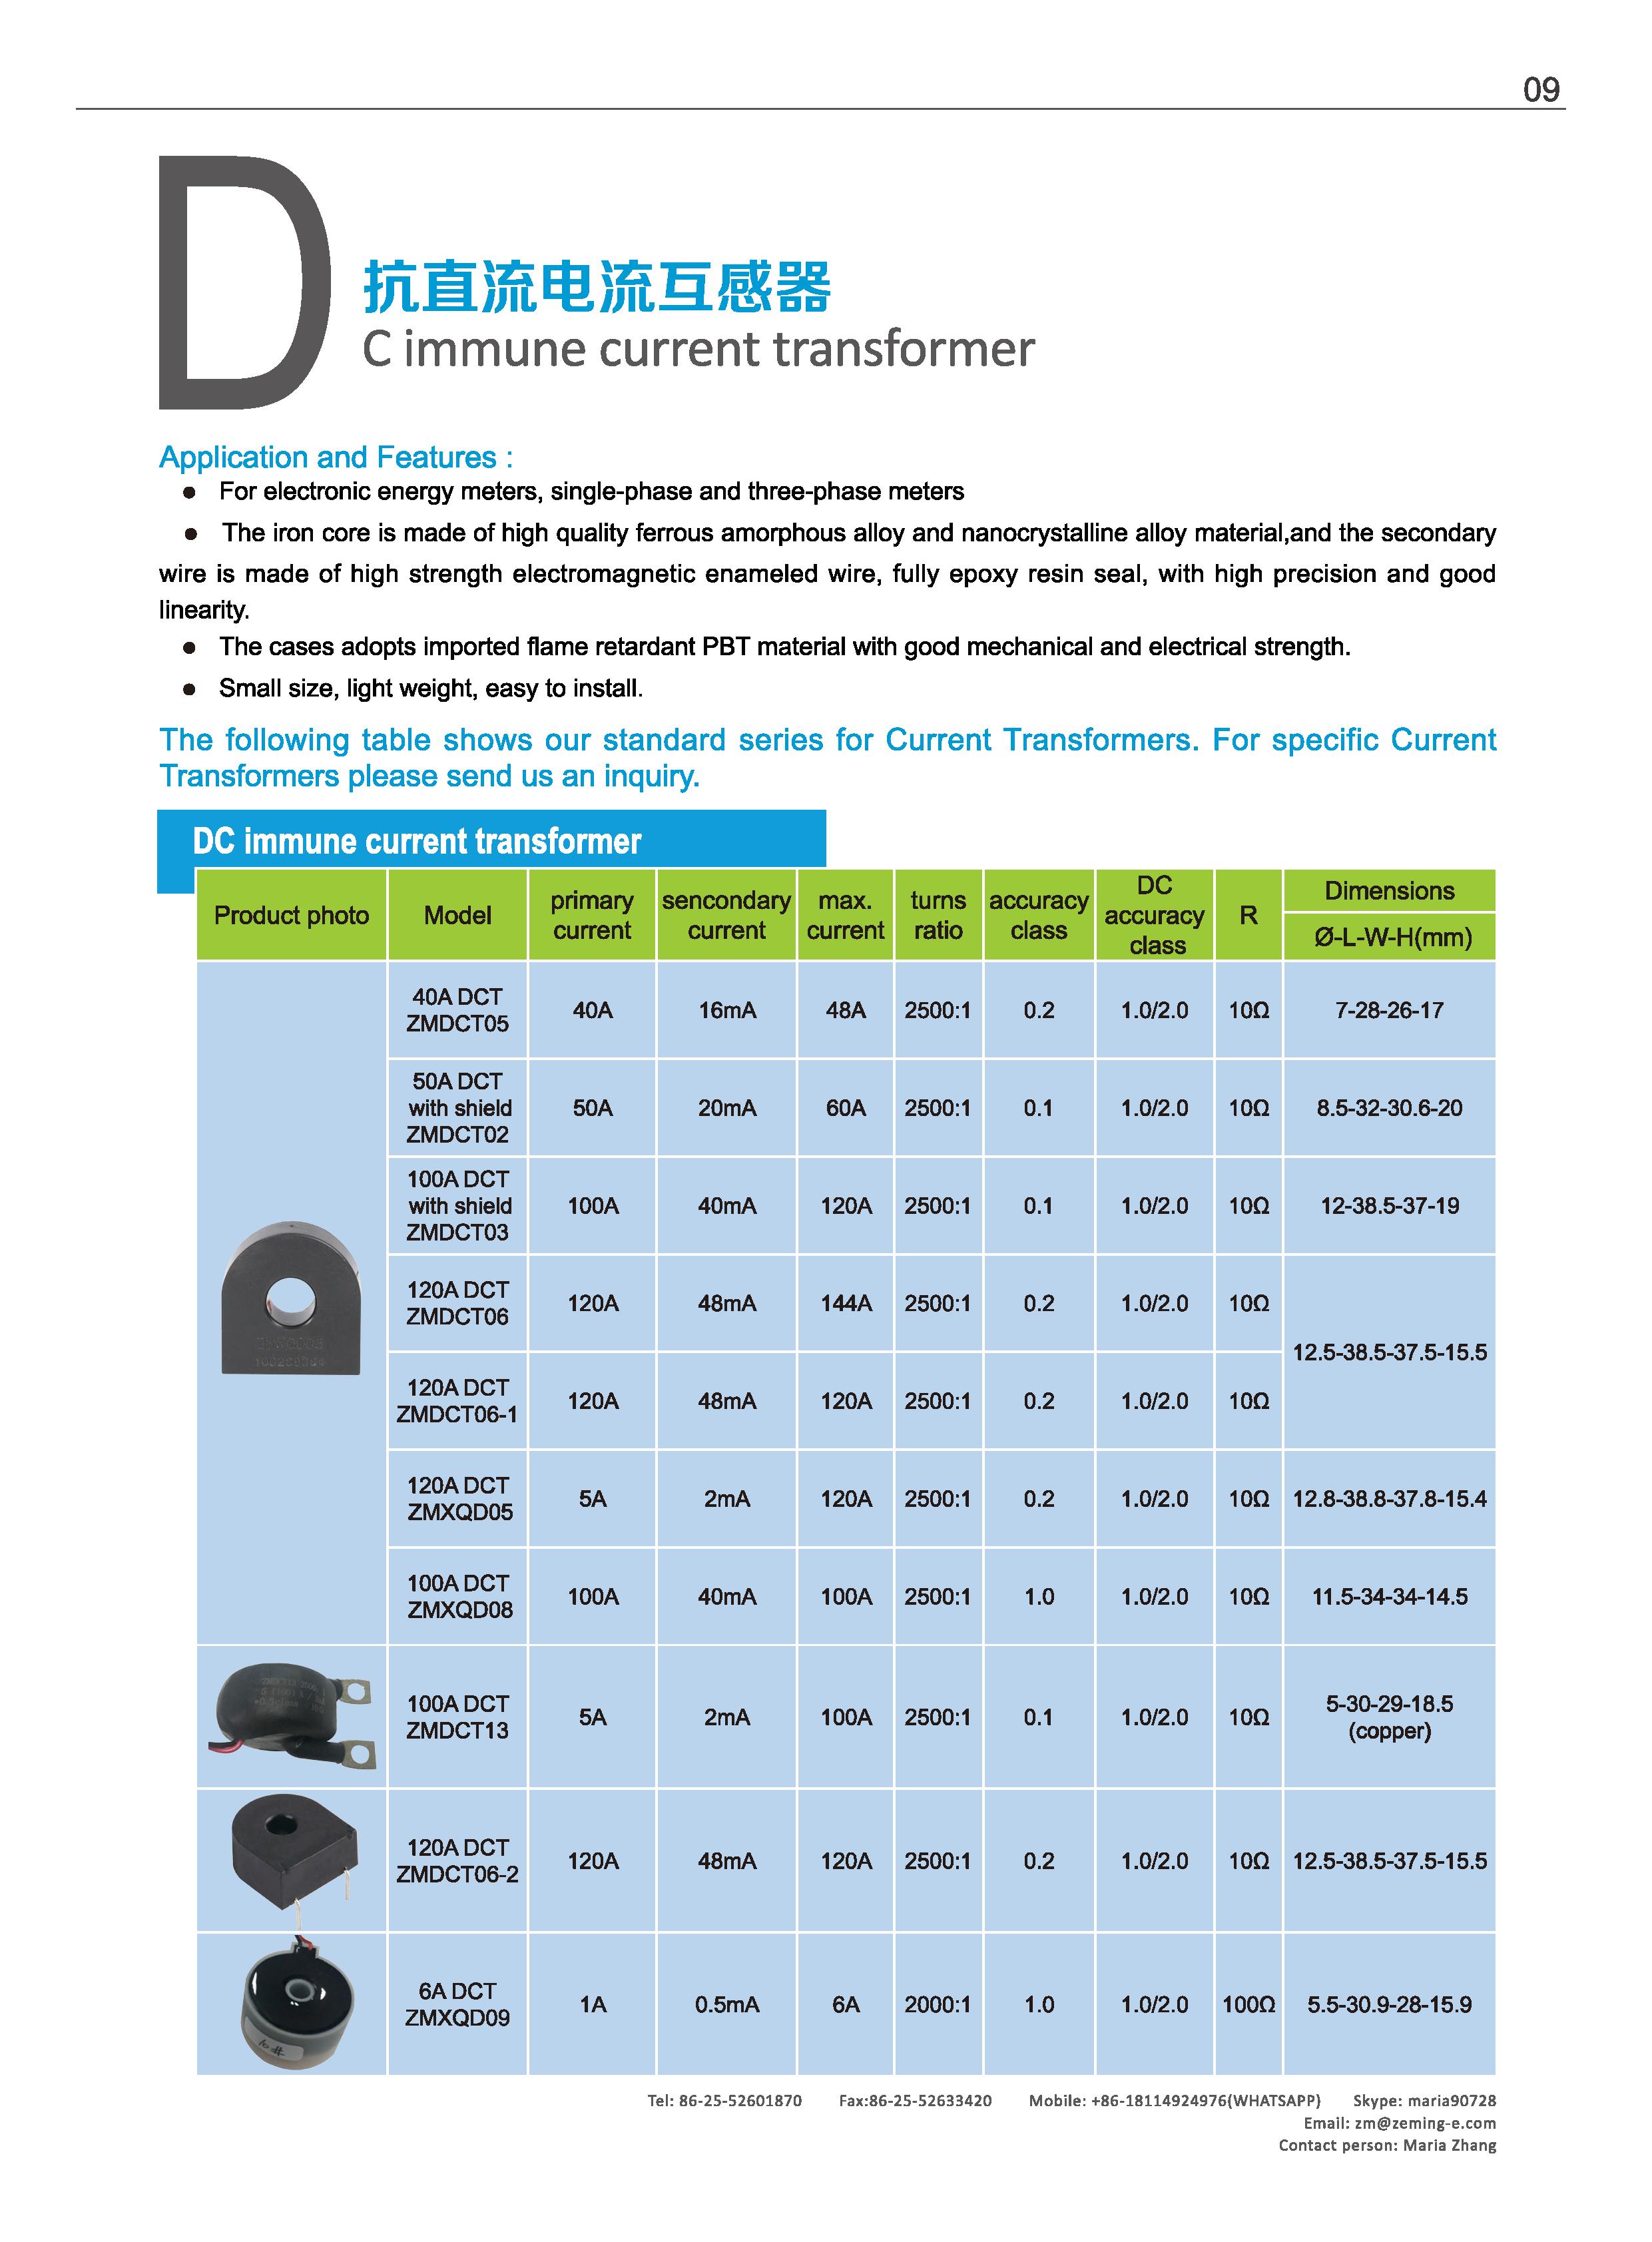 DC immune current transformer